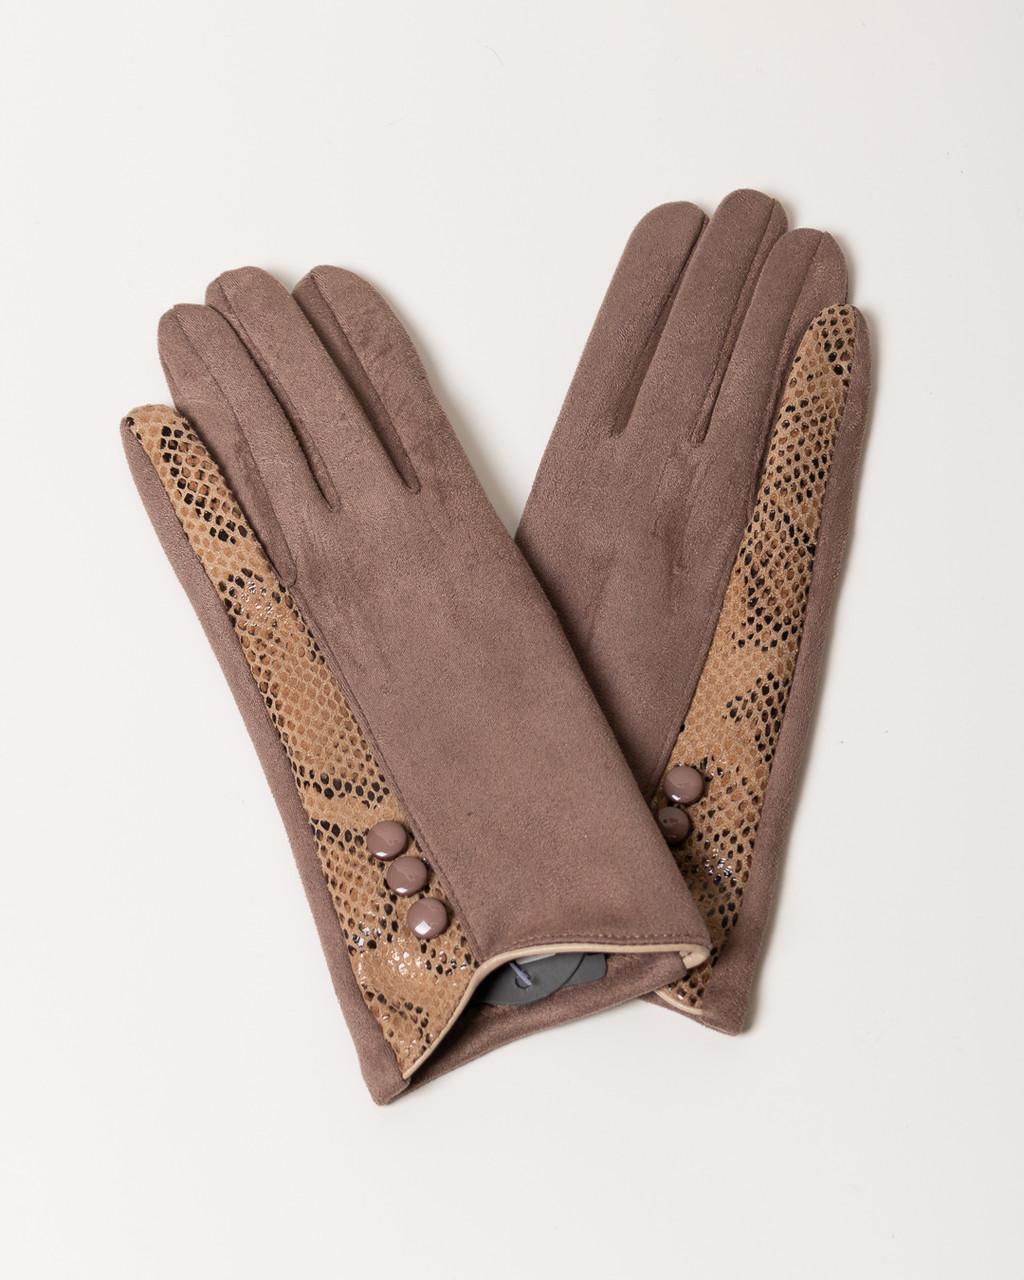 Перчатки женские MM SWEET G1552 TAUPE ZMEJKA TOUCH SCREEN